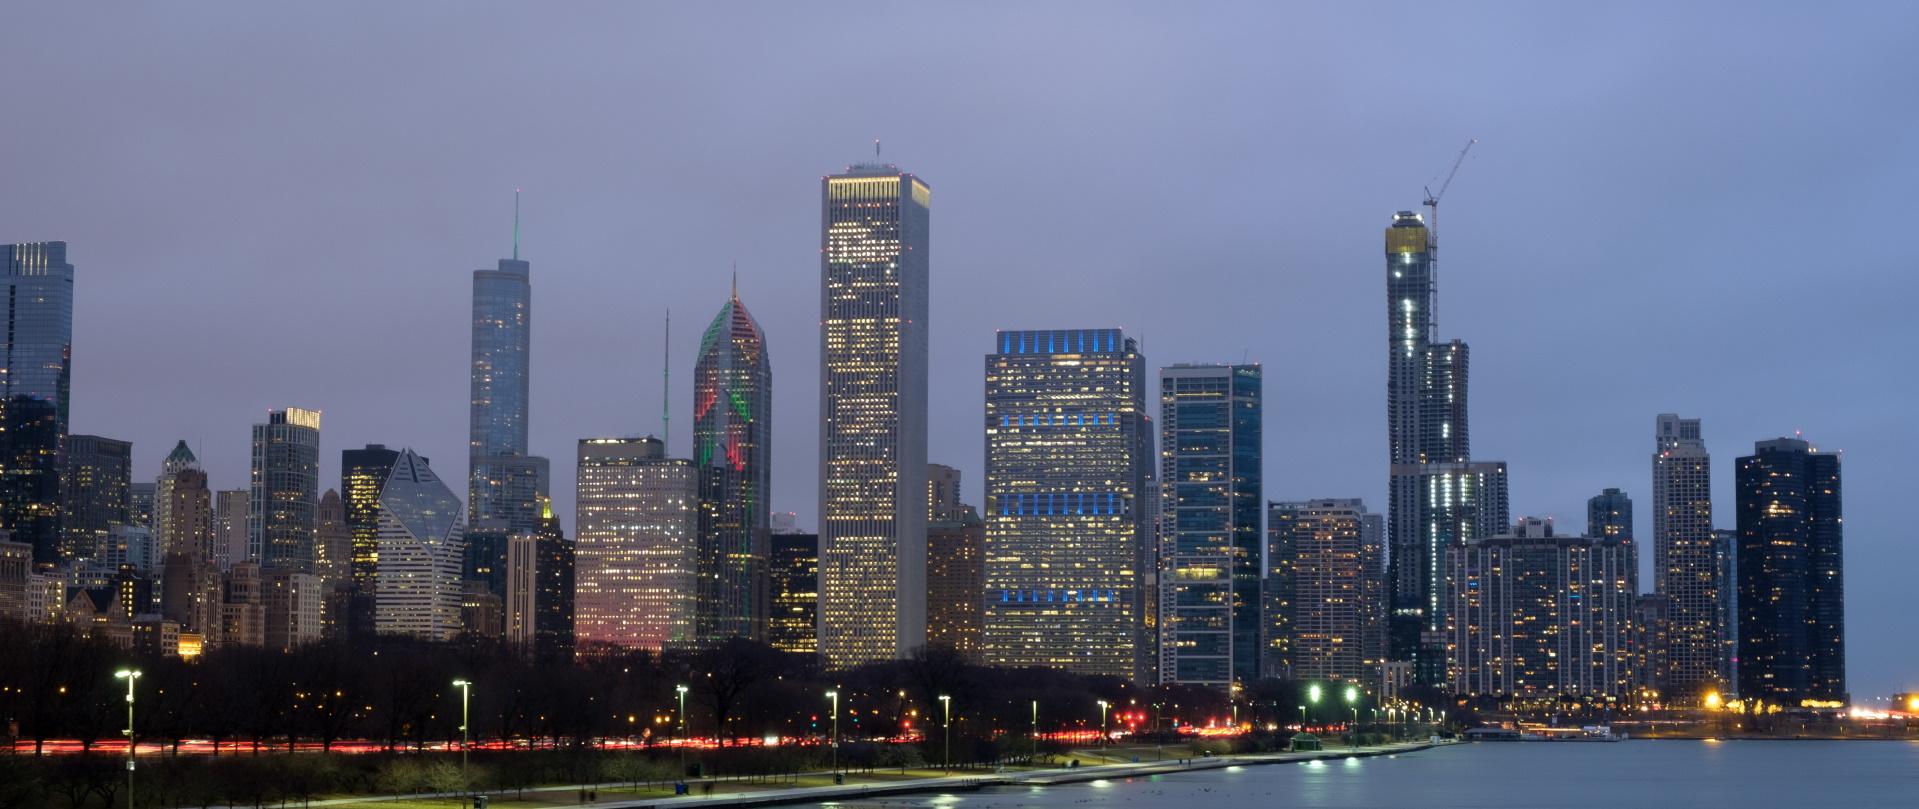 evening scenery of chicago downtown skyline chicag RJY7EHU